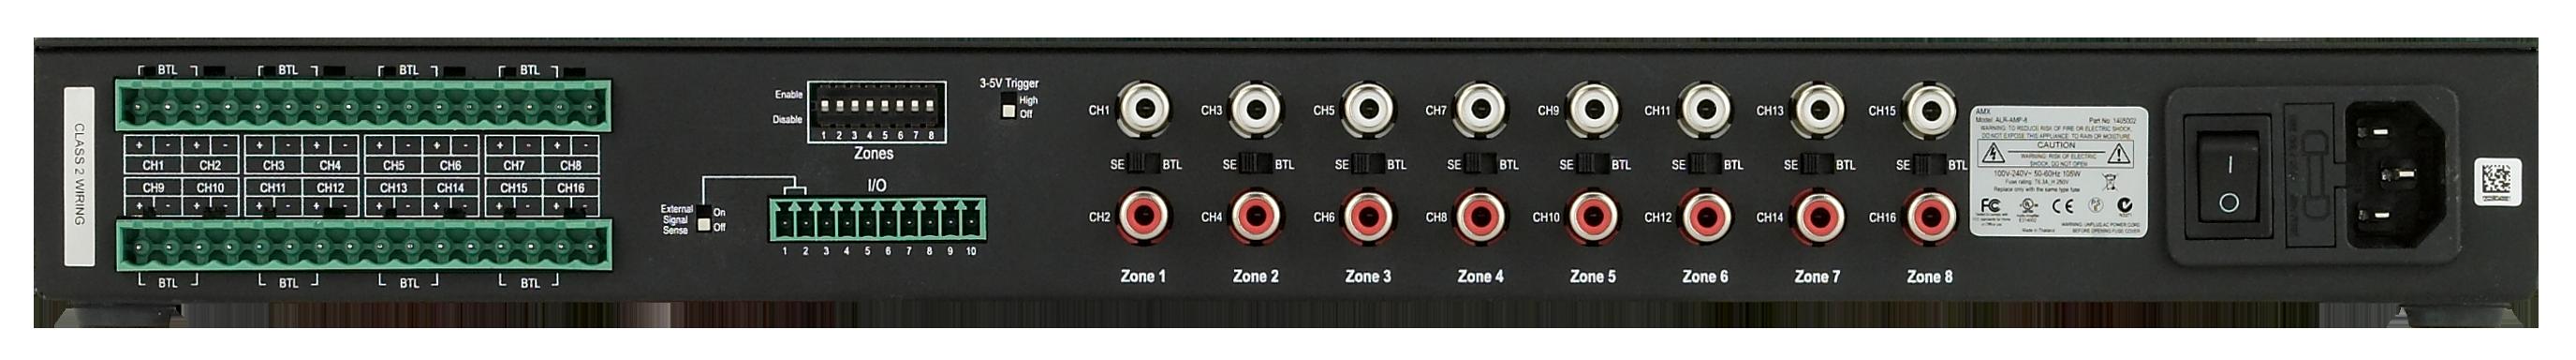 ALR-AMP-8 - Rear